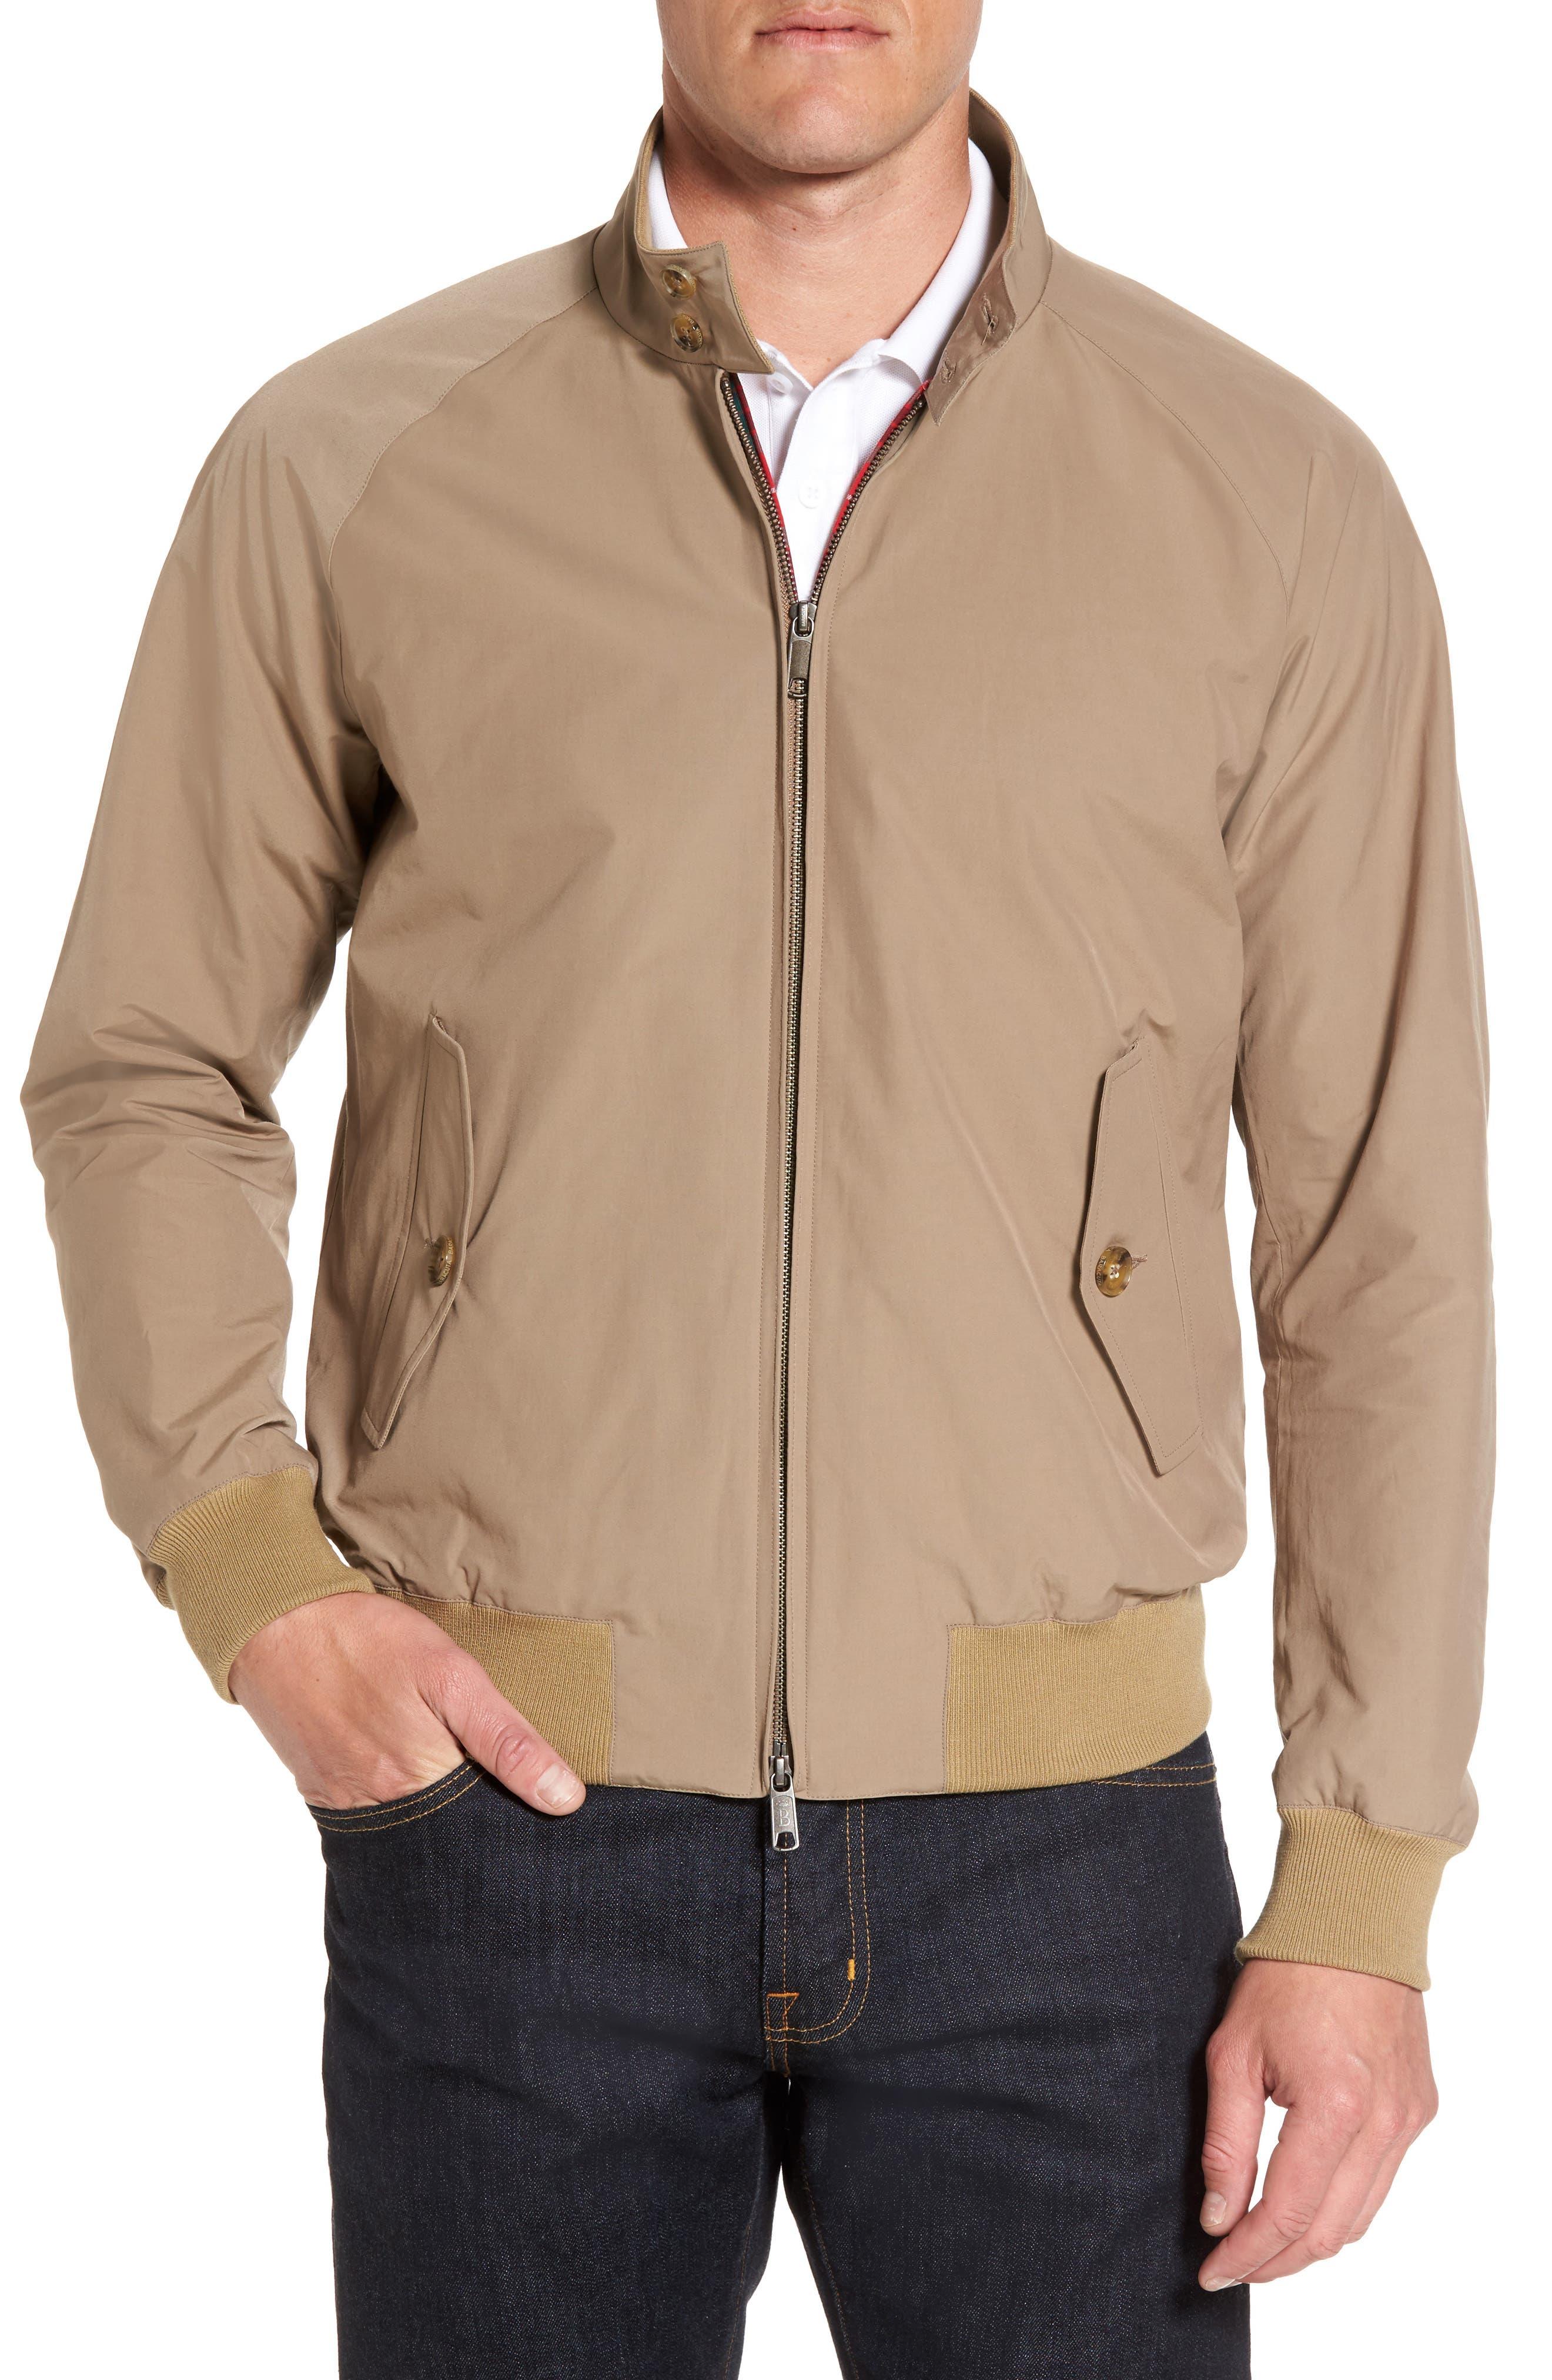 Alternate Image 1 Selected - Baracuta G9 Water Resistant Harrington Jacket